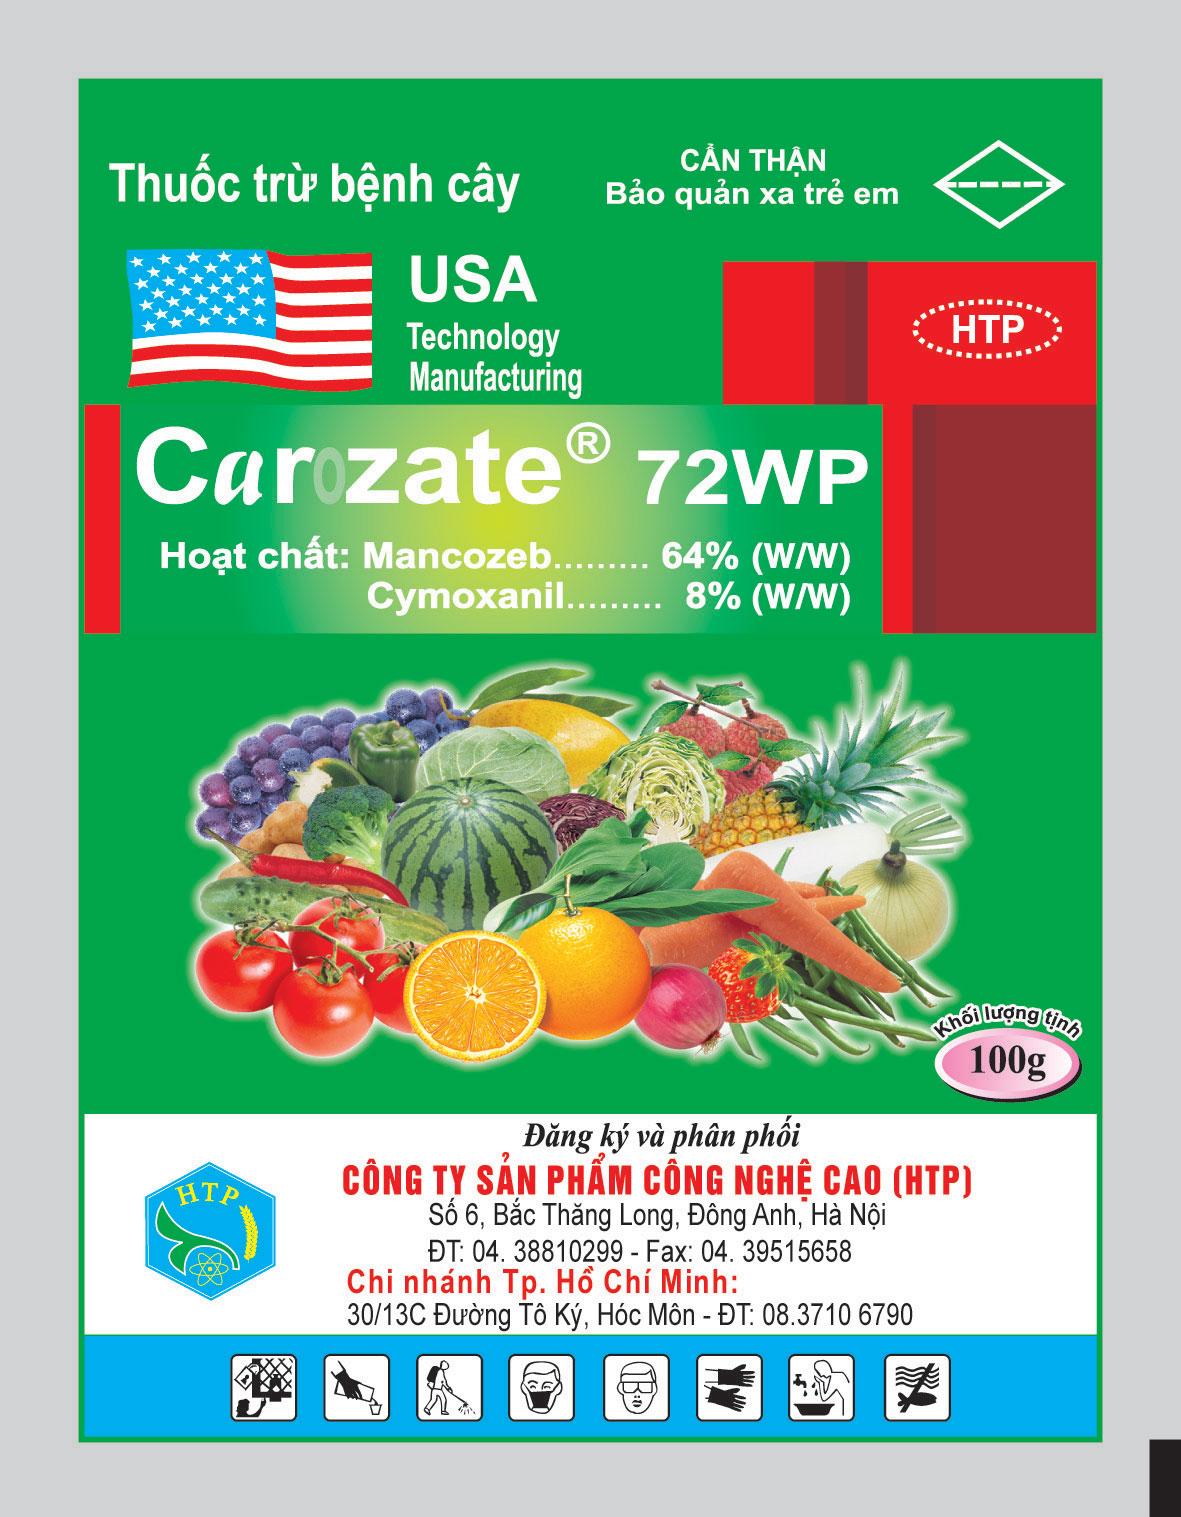 thuoc-tru-benh-carozate-72wp